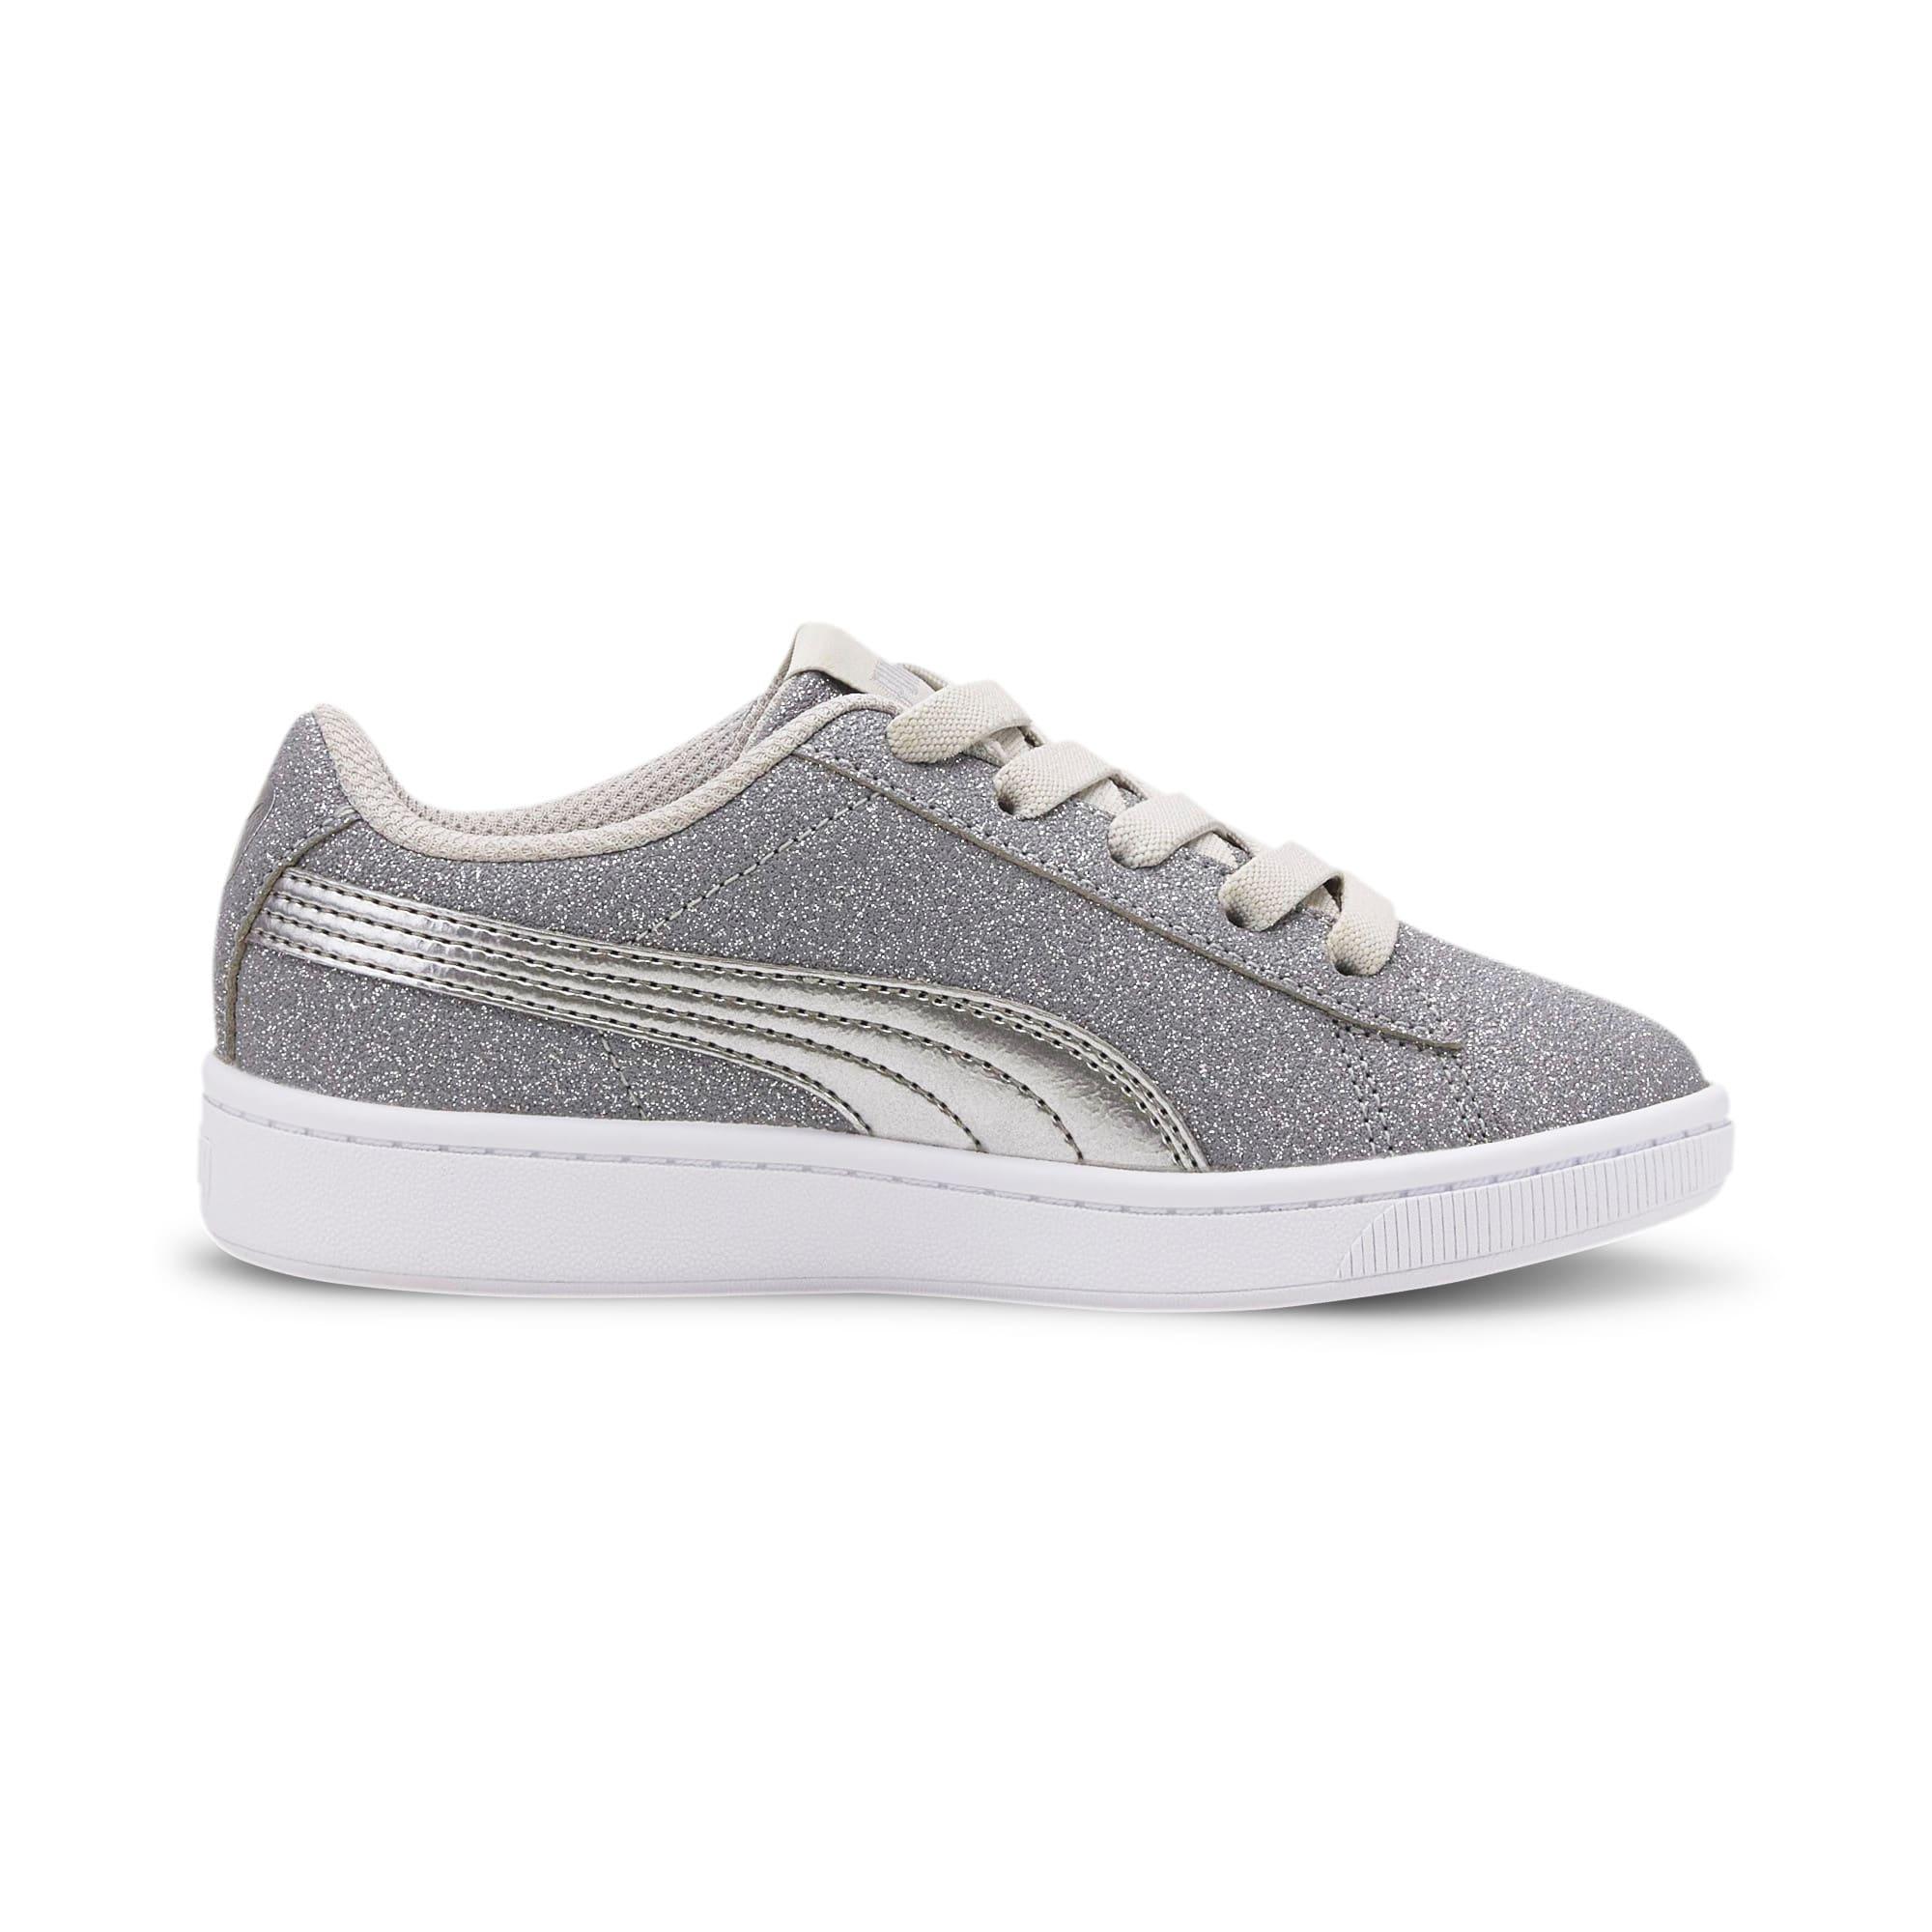 Thumbnail 5 of PUMA Vikky v2 Glitz AC Sneakers PS, Gray Violet-Silver-White, medium